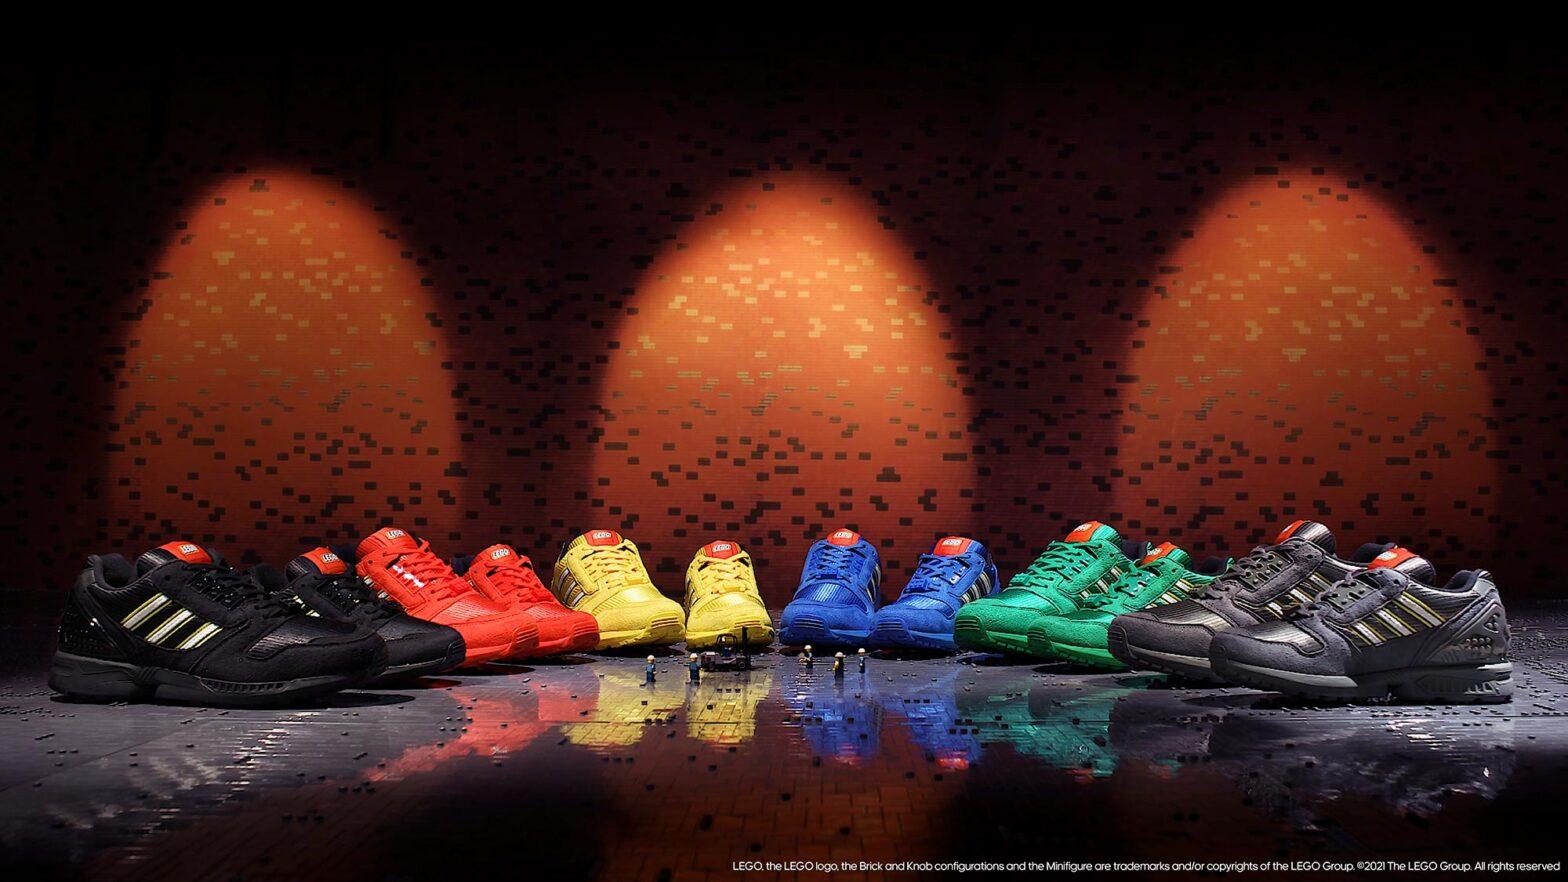 adidas Originals x LEGO ZX 800 'Bricks' Collection